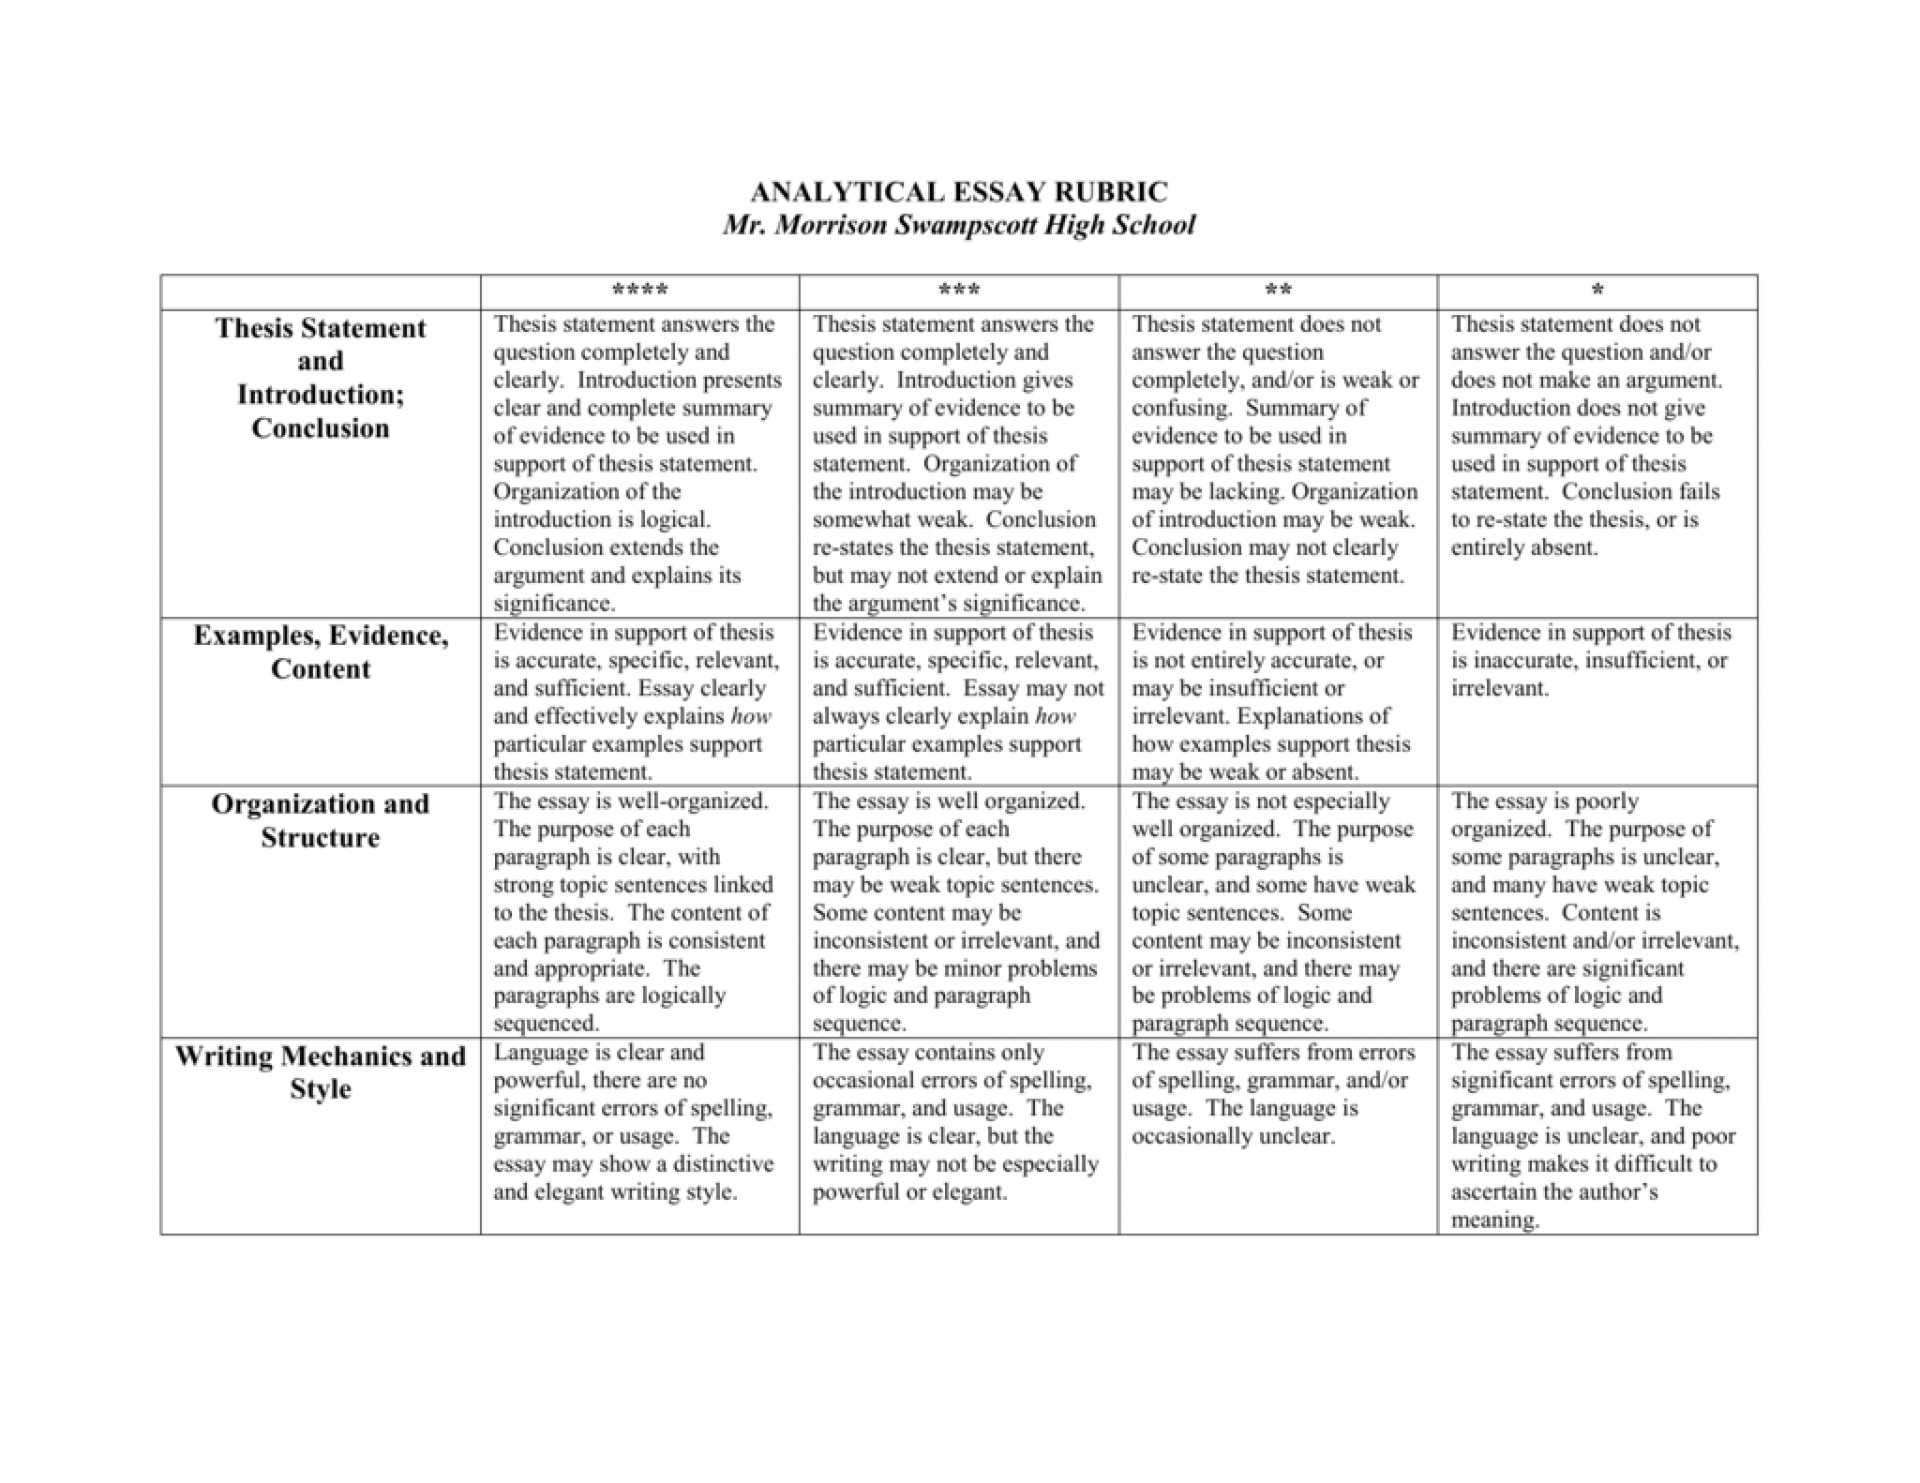 002 Essay Rubric High School Example 007885254 2 Impressive Analytical Informative 1920